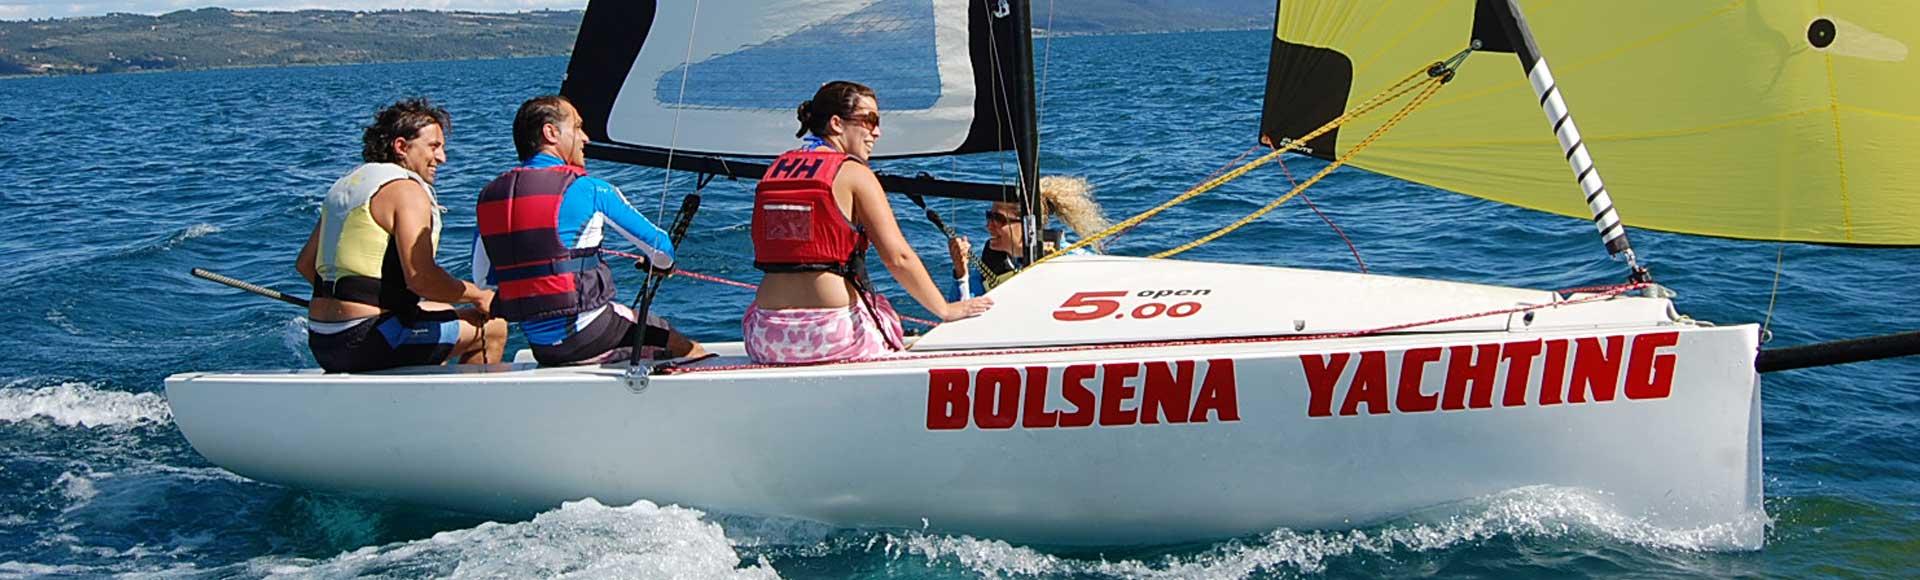 Yacht Club Bolsena